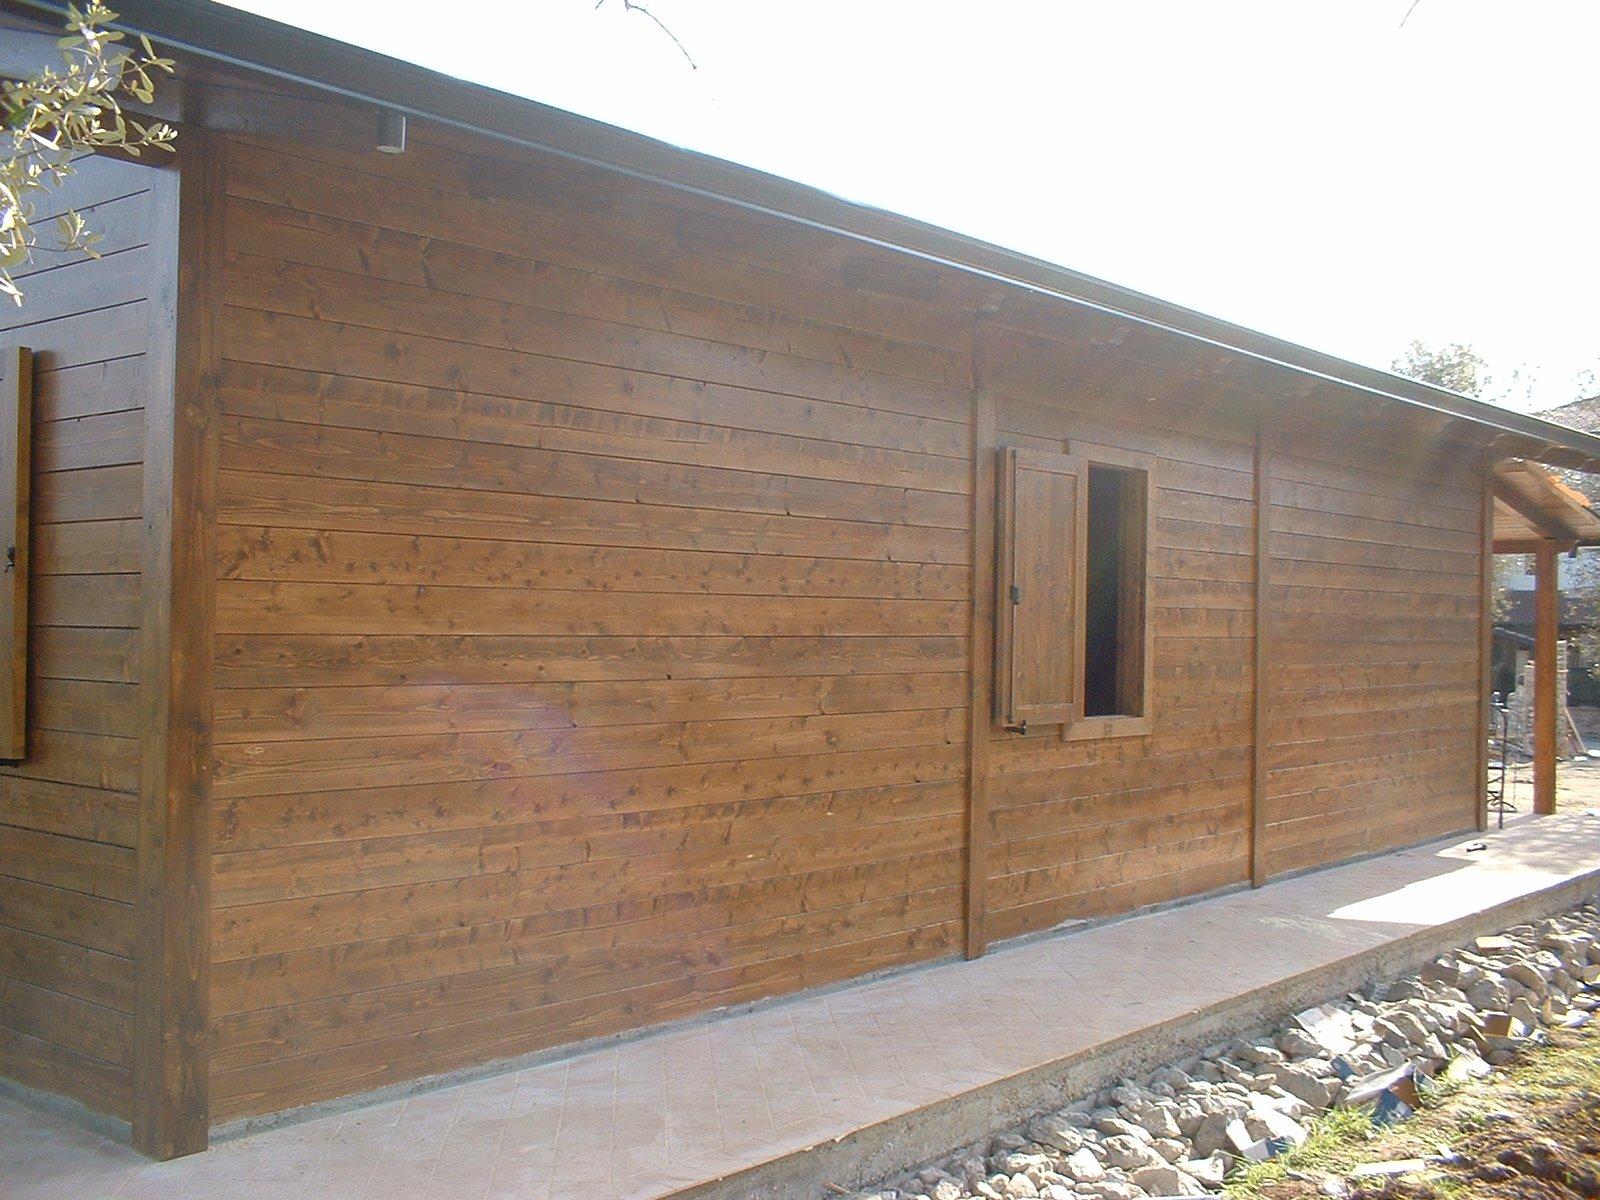 Casa in legno 120 mq for Case in legno prefabbricate usate